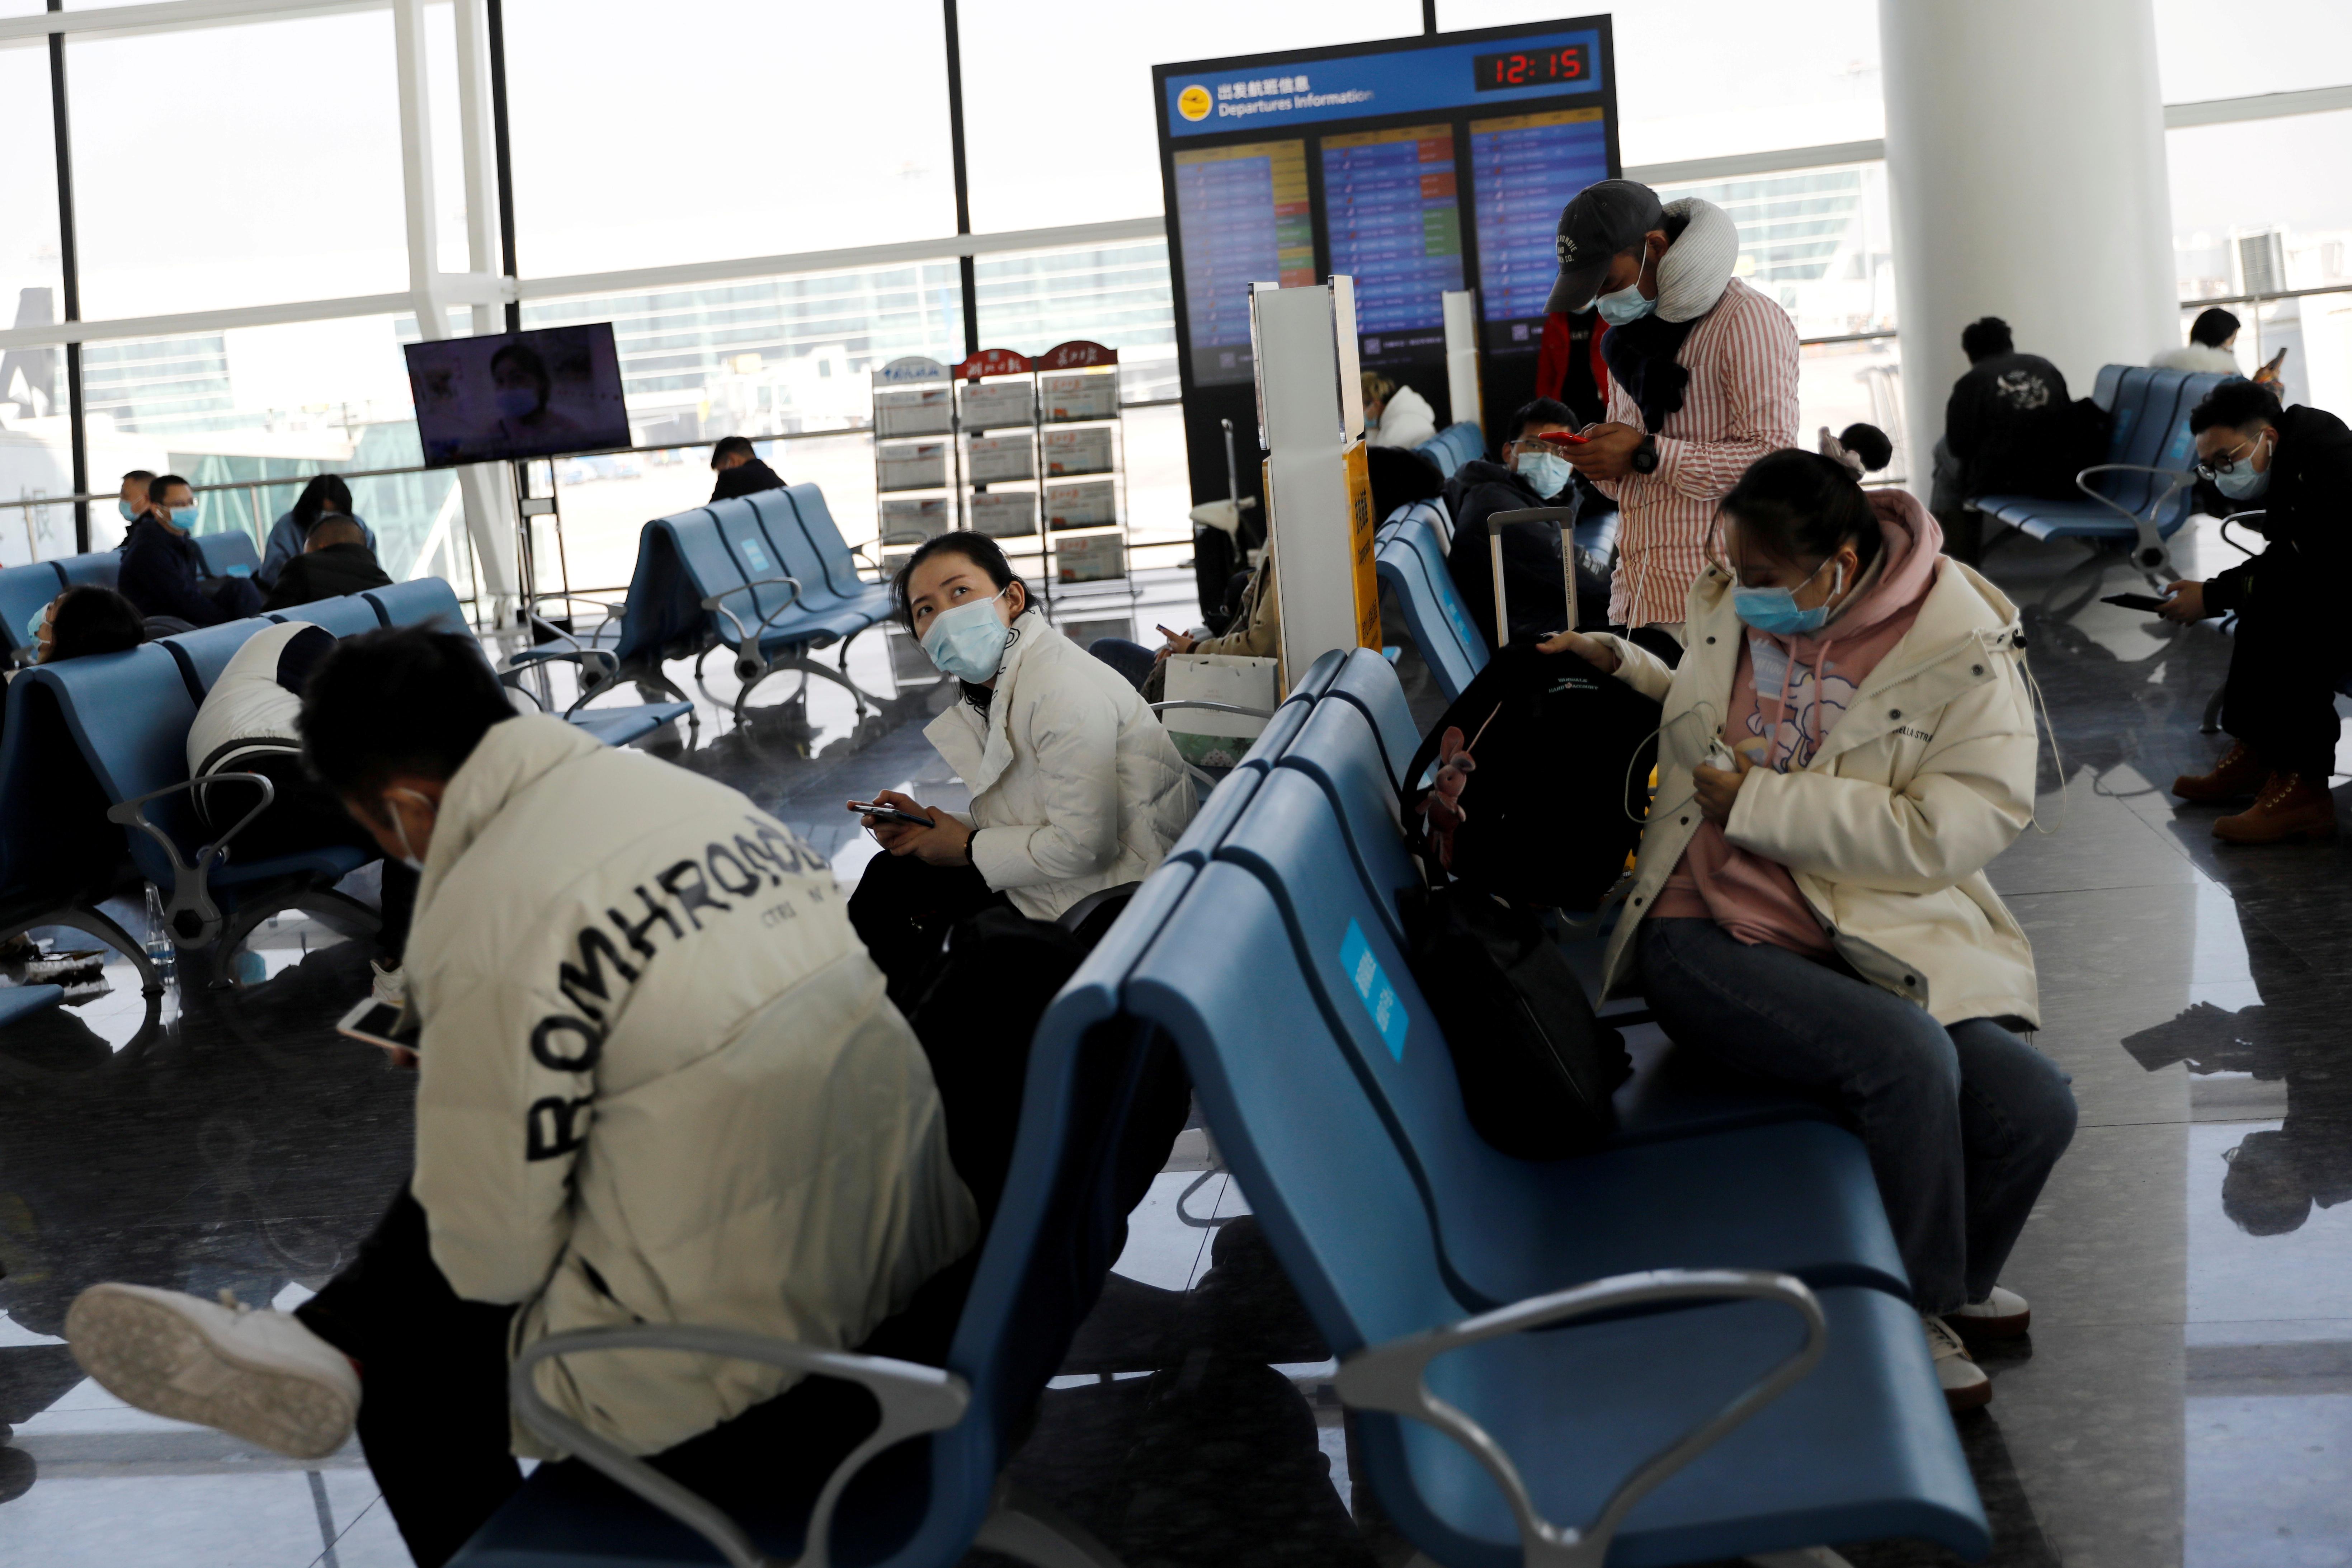 Travellers wait at Wuhan Tianhe International Airport following the coronavirus disease (COVID-19) outbreak in Wuhan, Hubei province, China January 2, 2021. REUTERS/Tingshu Wang/File Photo